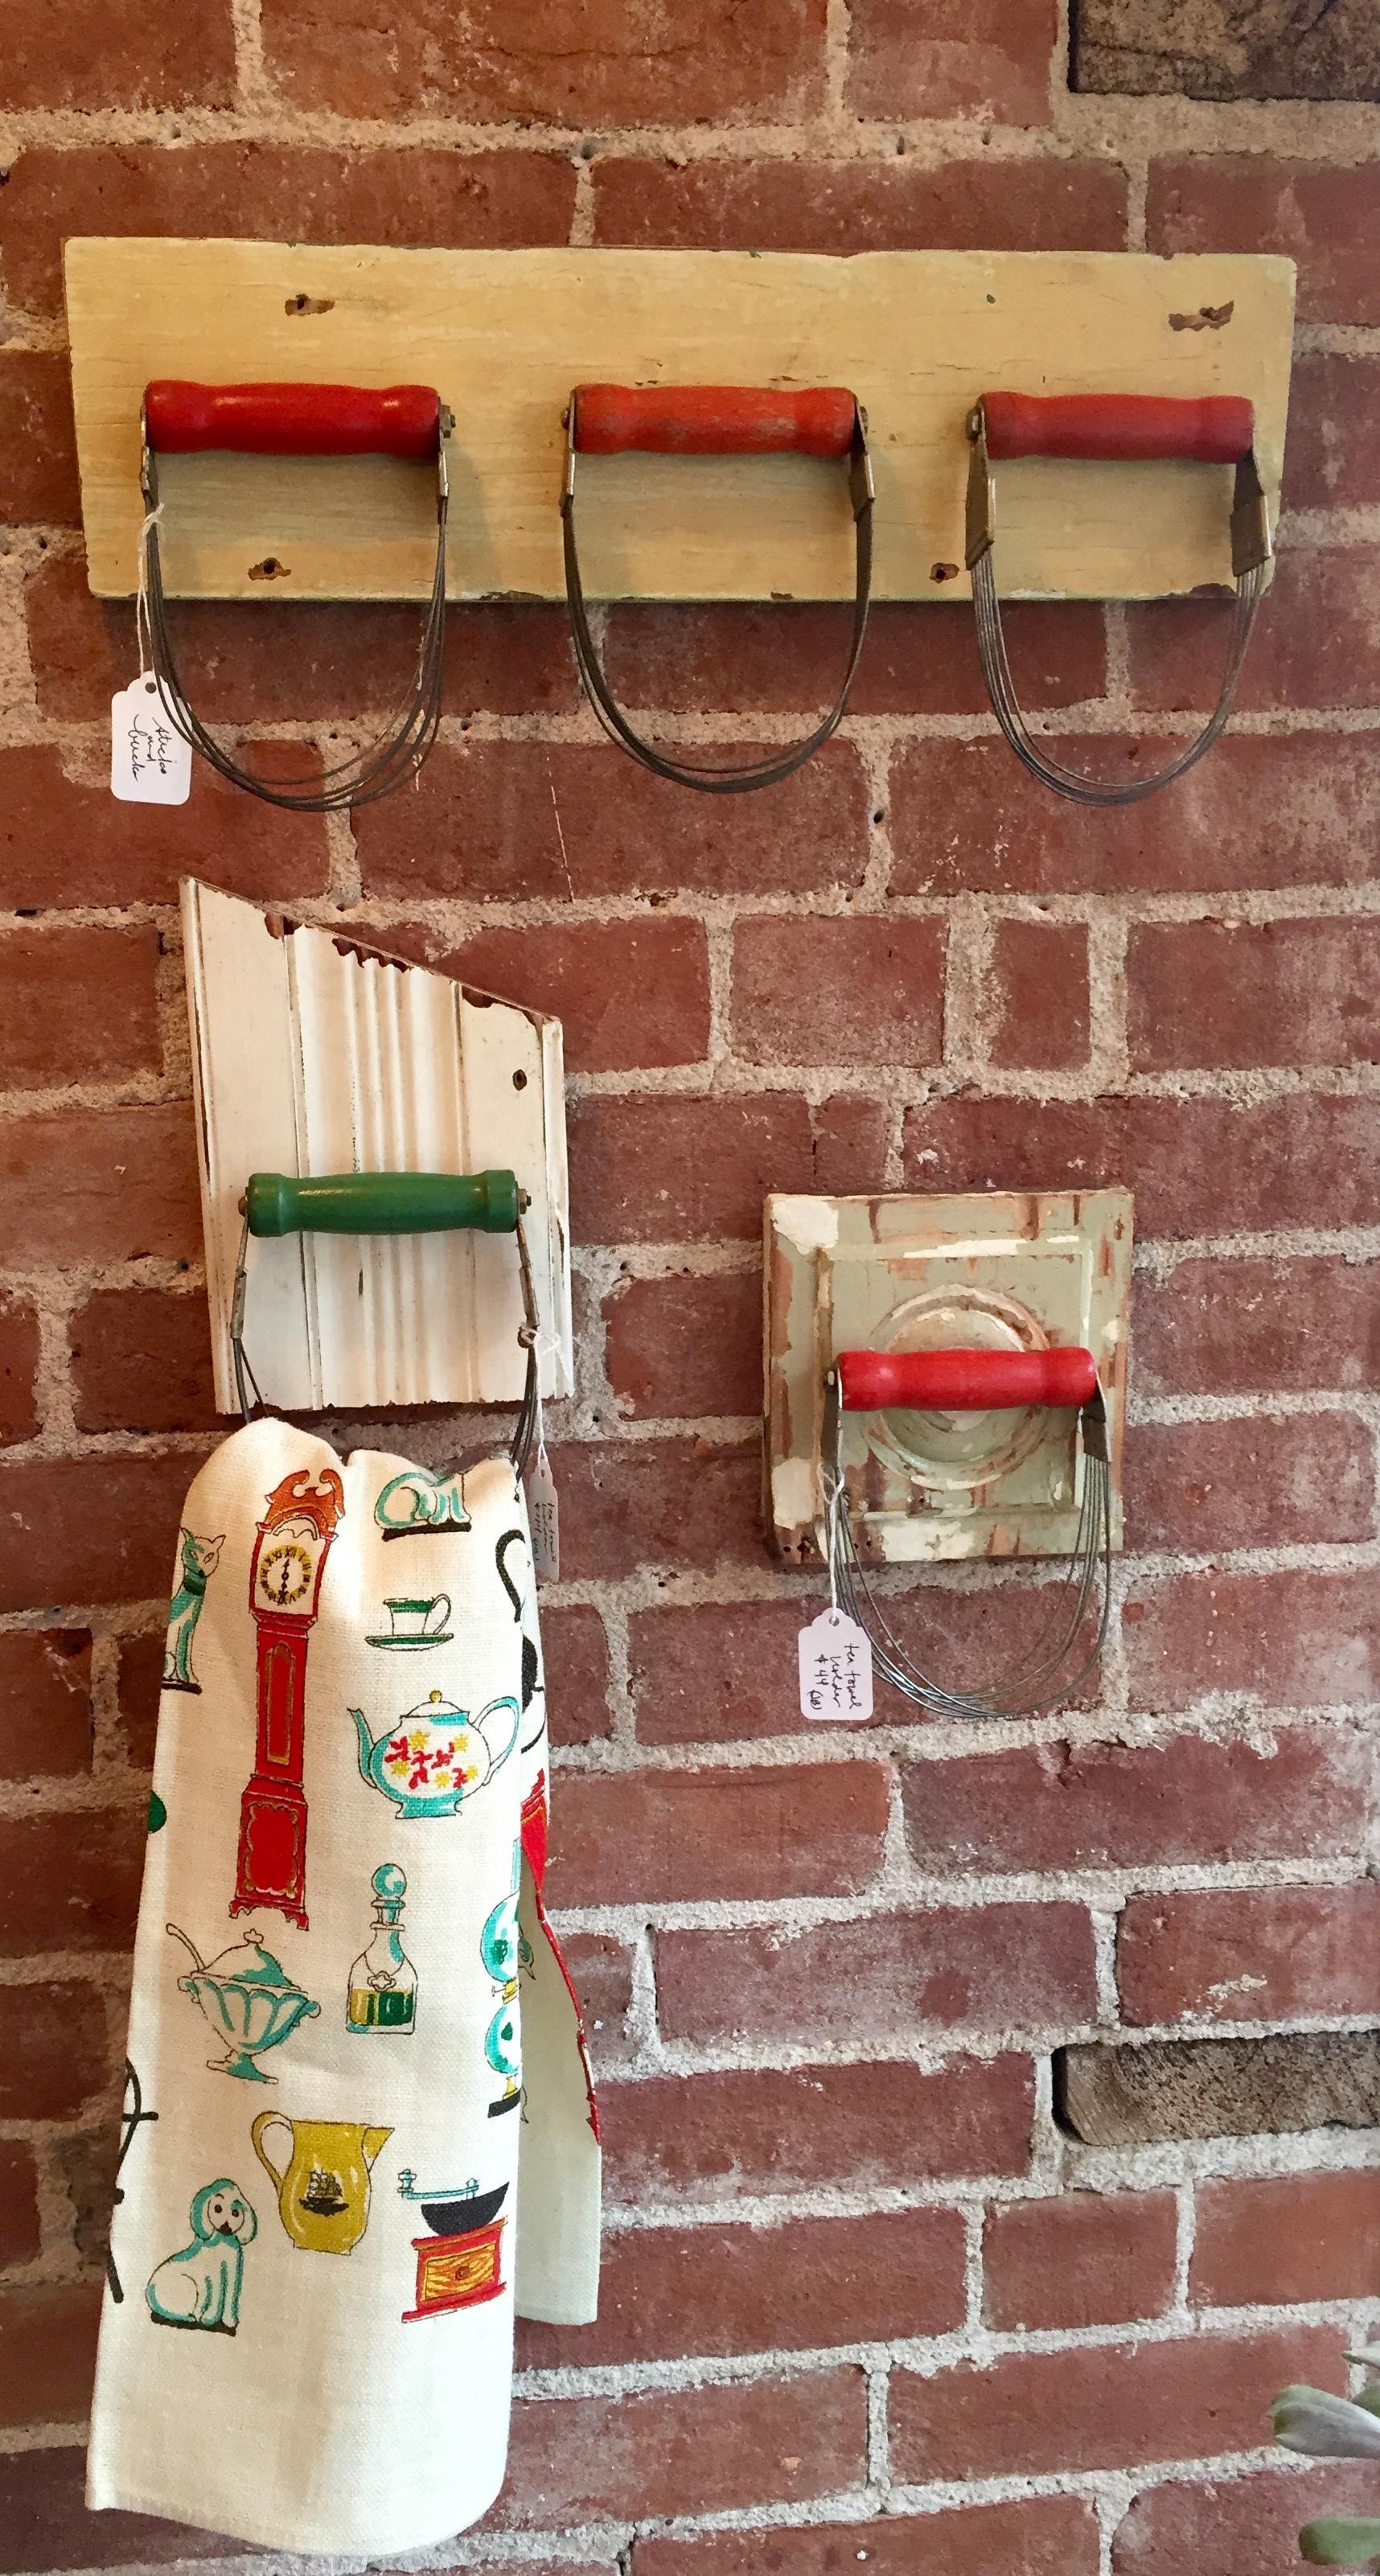 Pastry Cutter Tea Towel Holders